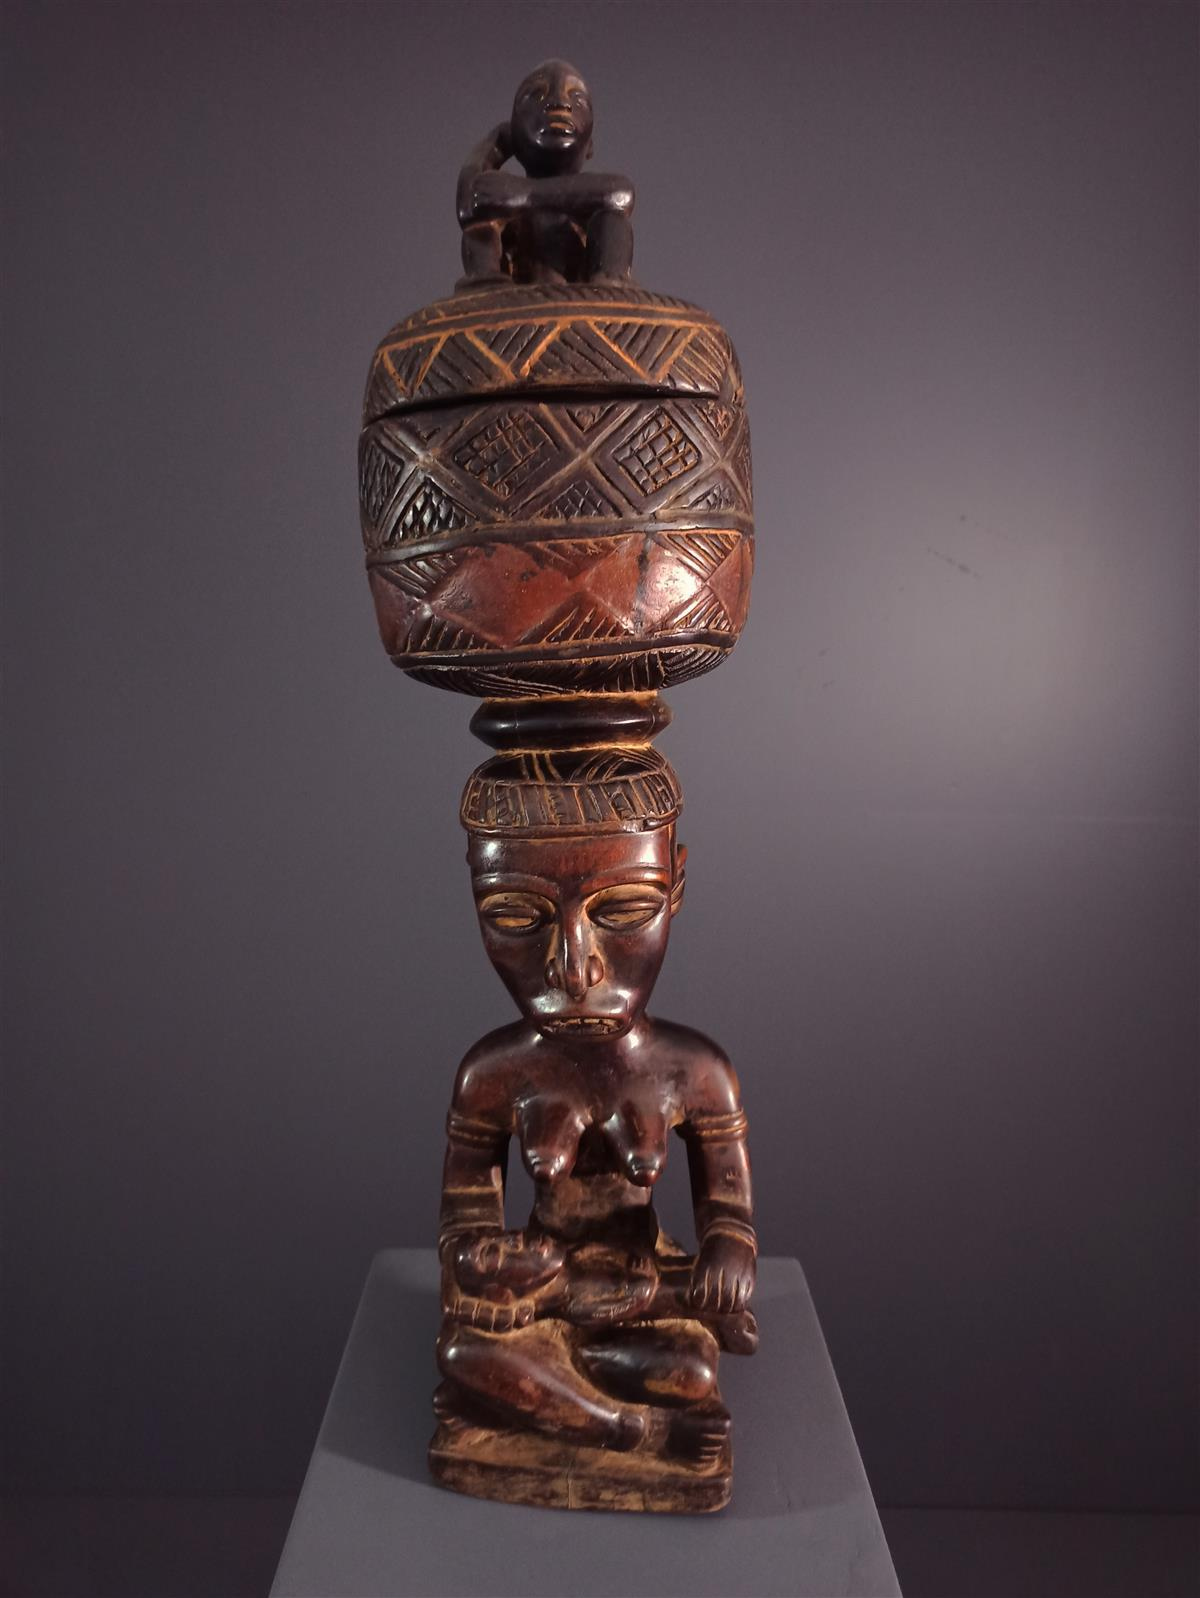 Boite Kongo - Art africain